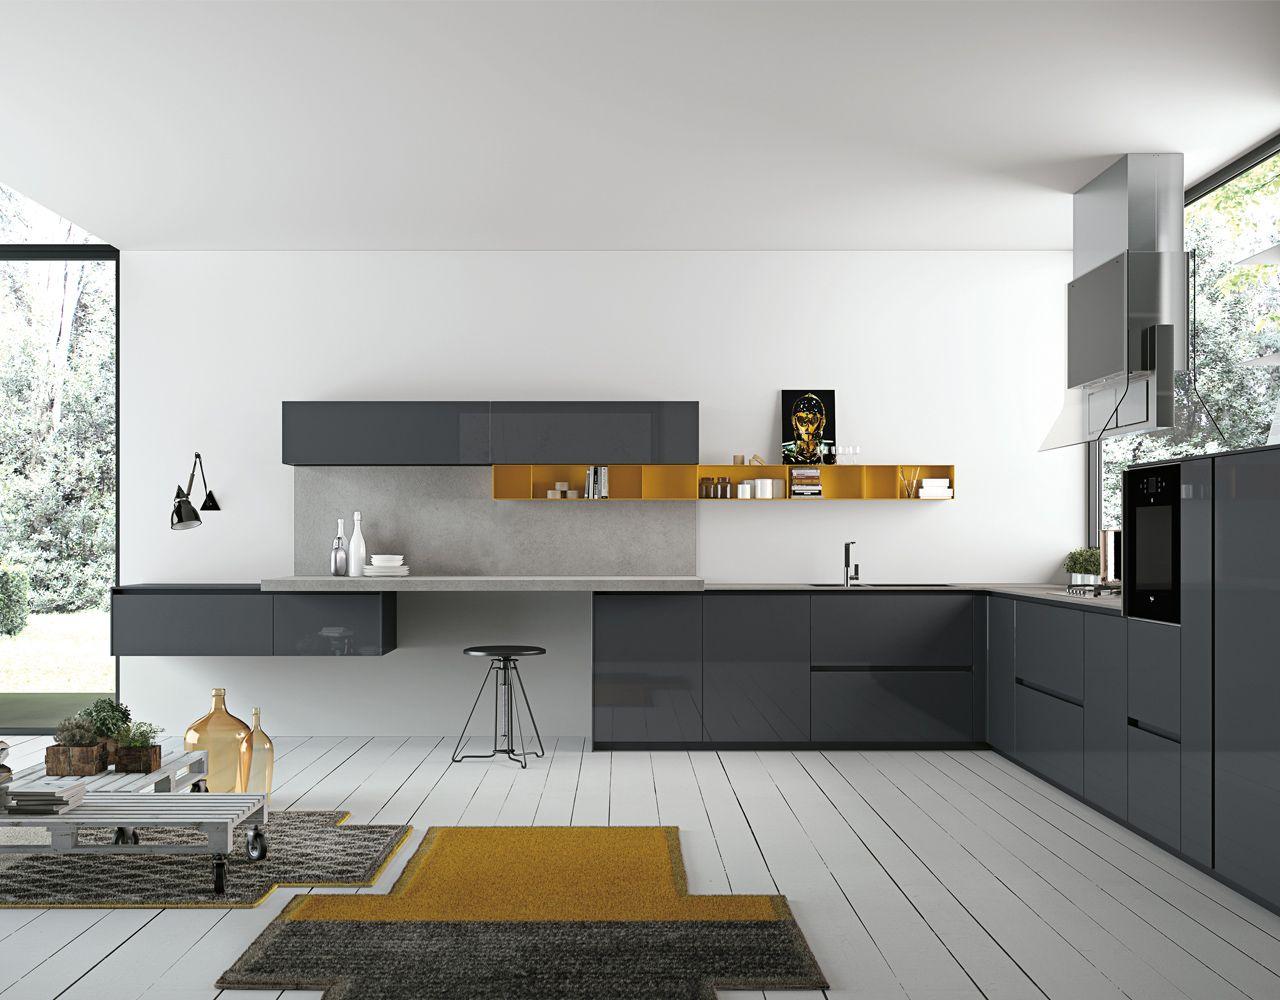 Doimo Cucine | Salone del Mobile | Scandinavian Style | Pinterest ...